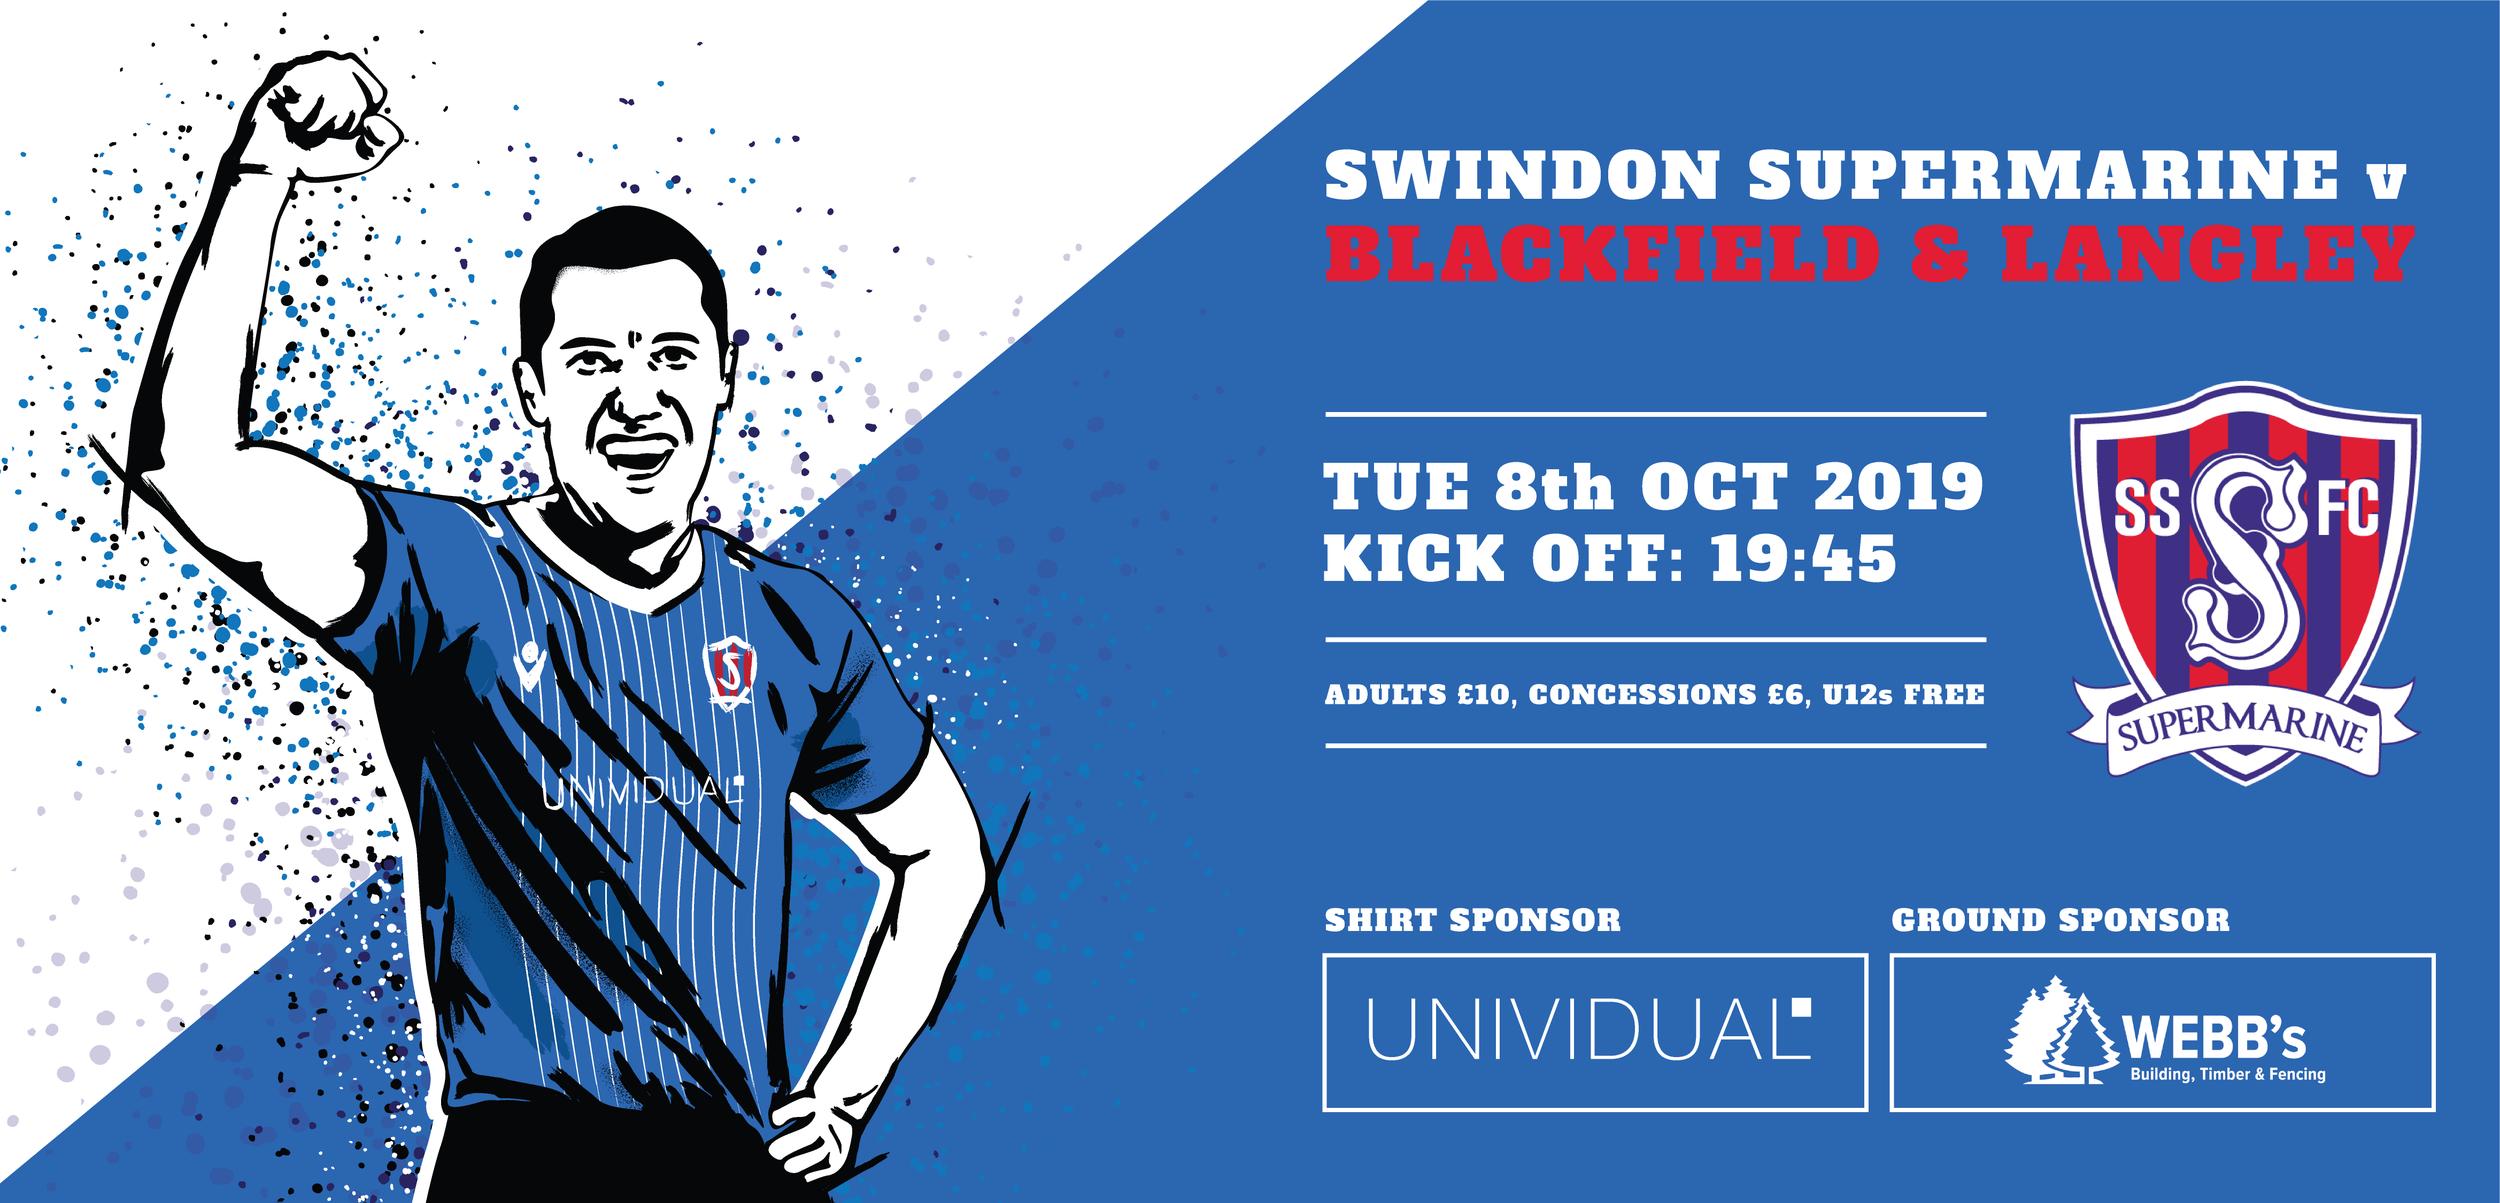 02 Swindon Fixture v Blackfield Langley-01.png